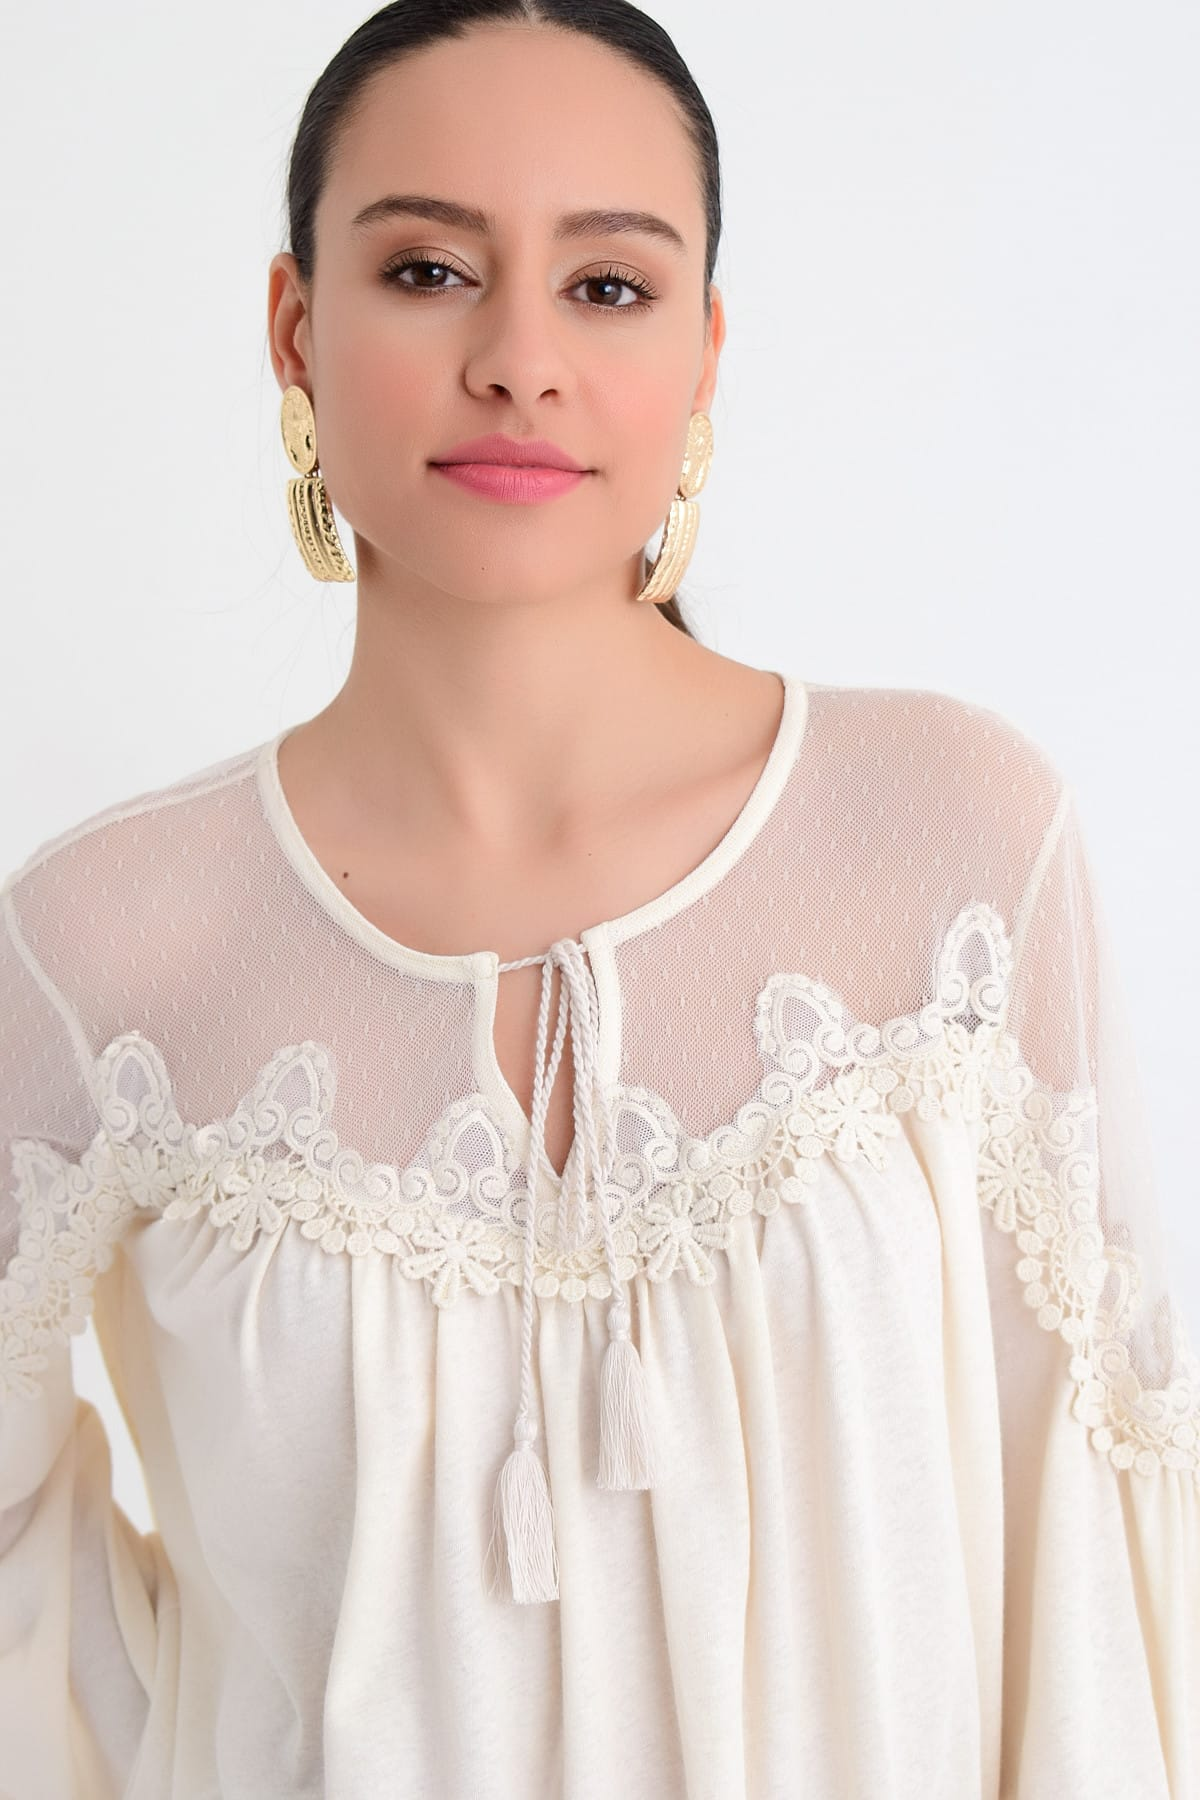 Hanna's by Hanna Darsa Kadın Beyaz Tül Detaylı Dantelli Uzun Kollu Bluz HN1746 2